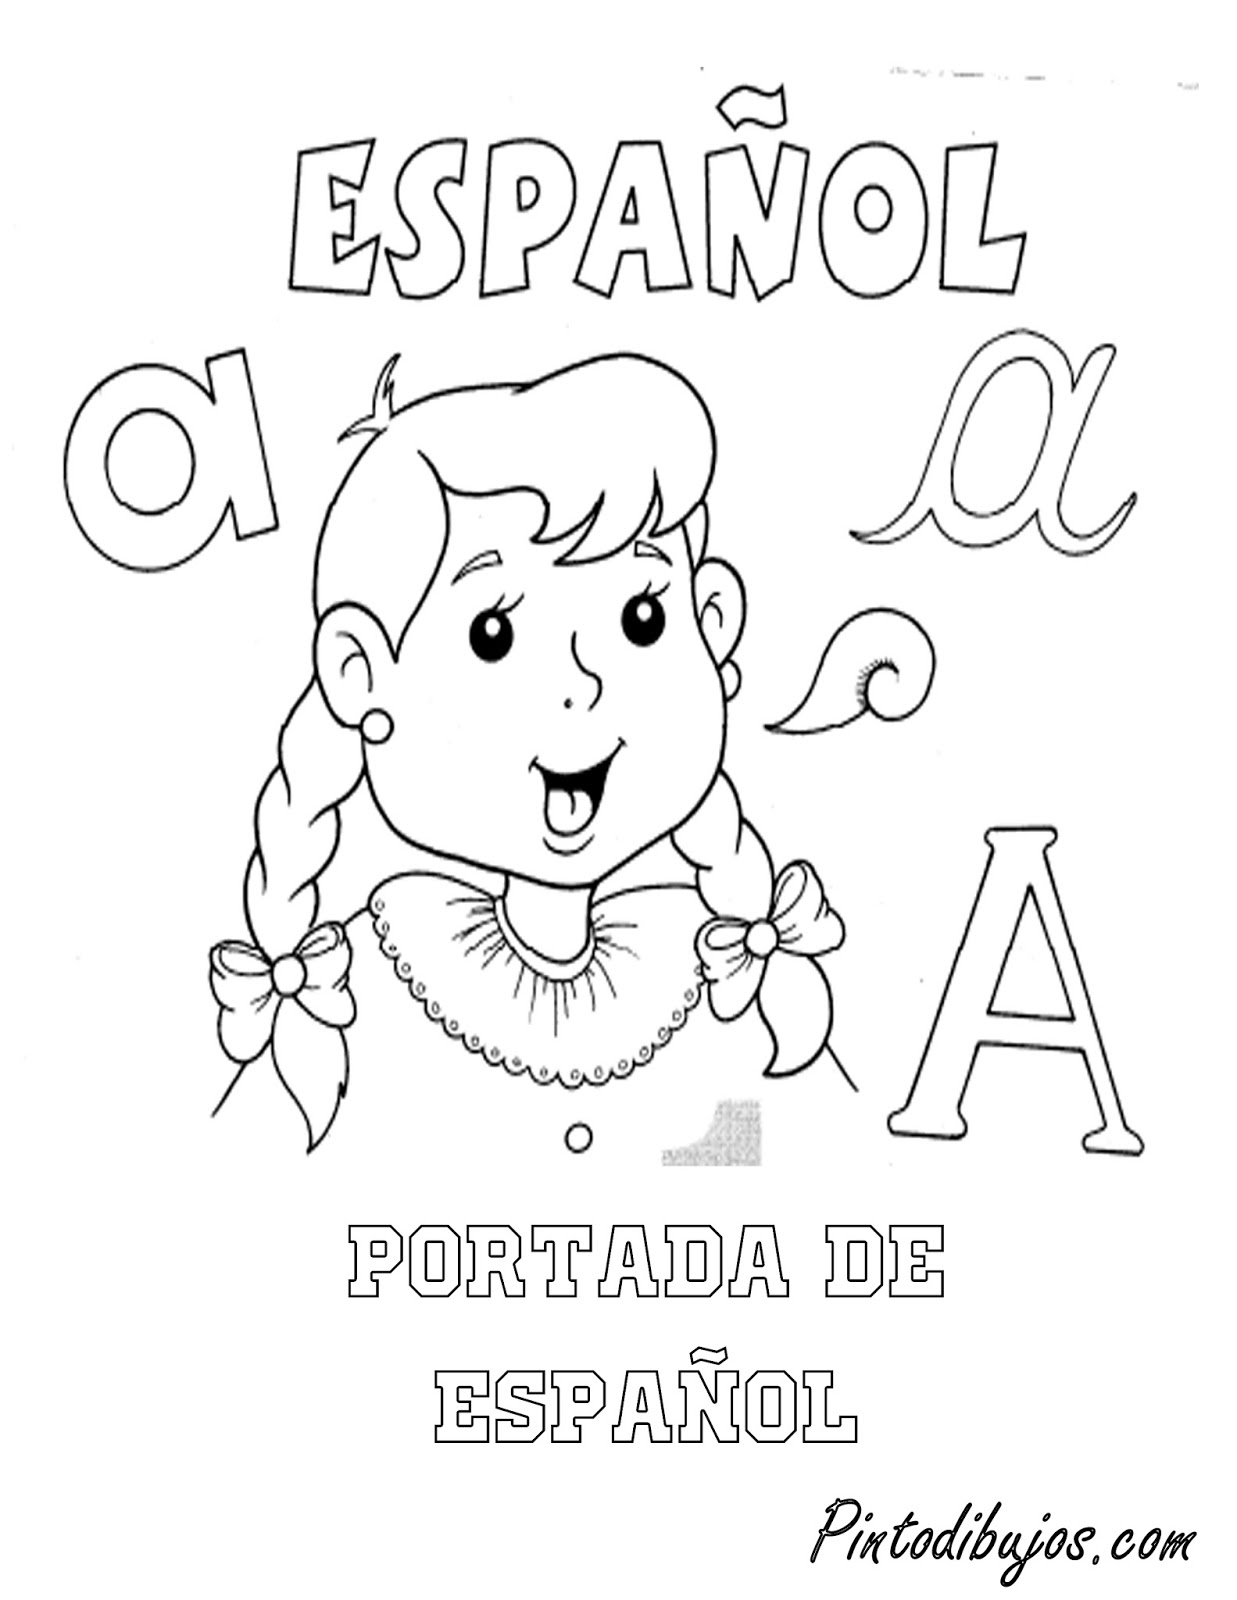 Pinto Dibujos: Portada de Español para colorear